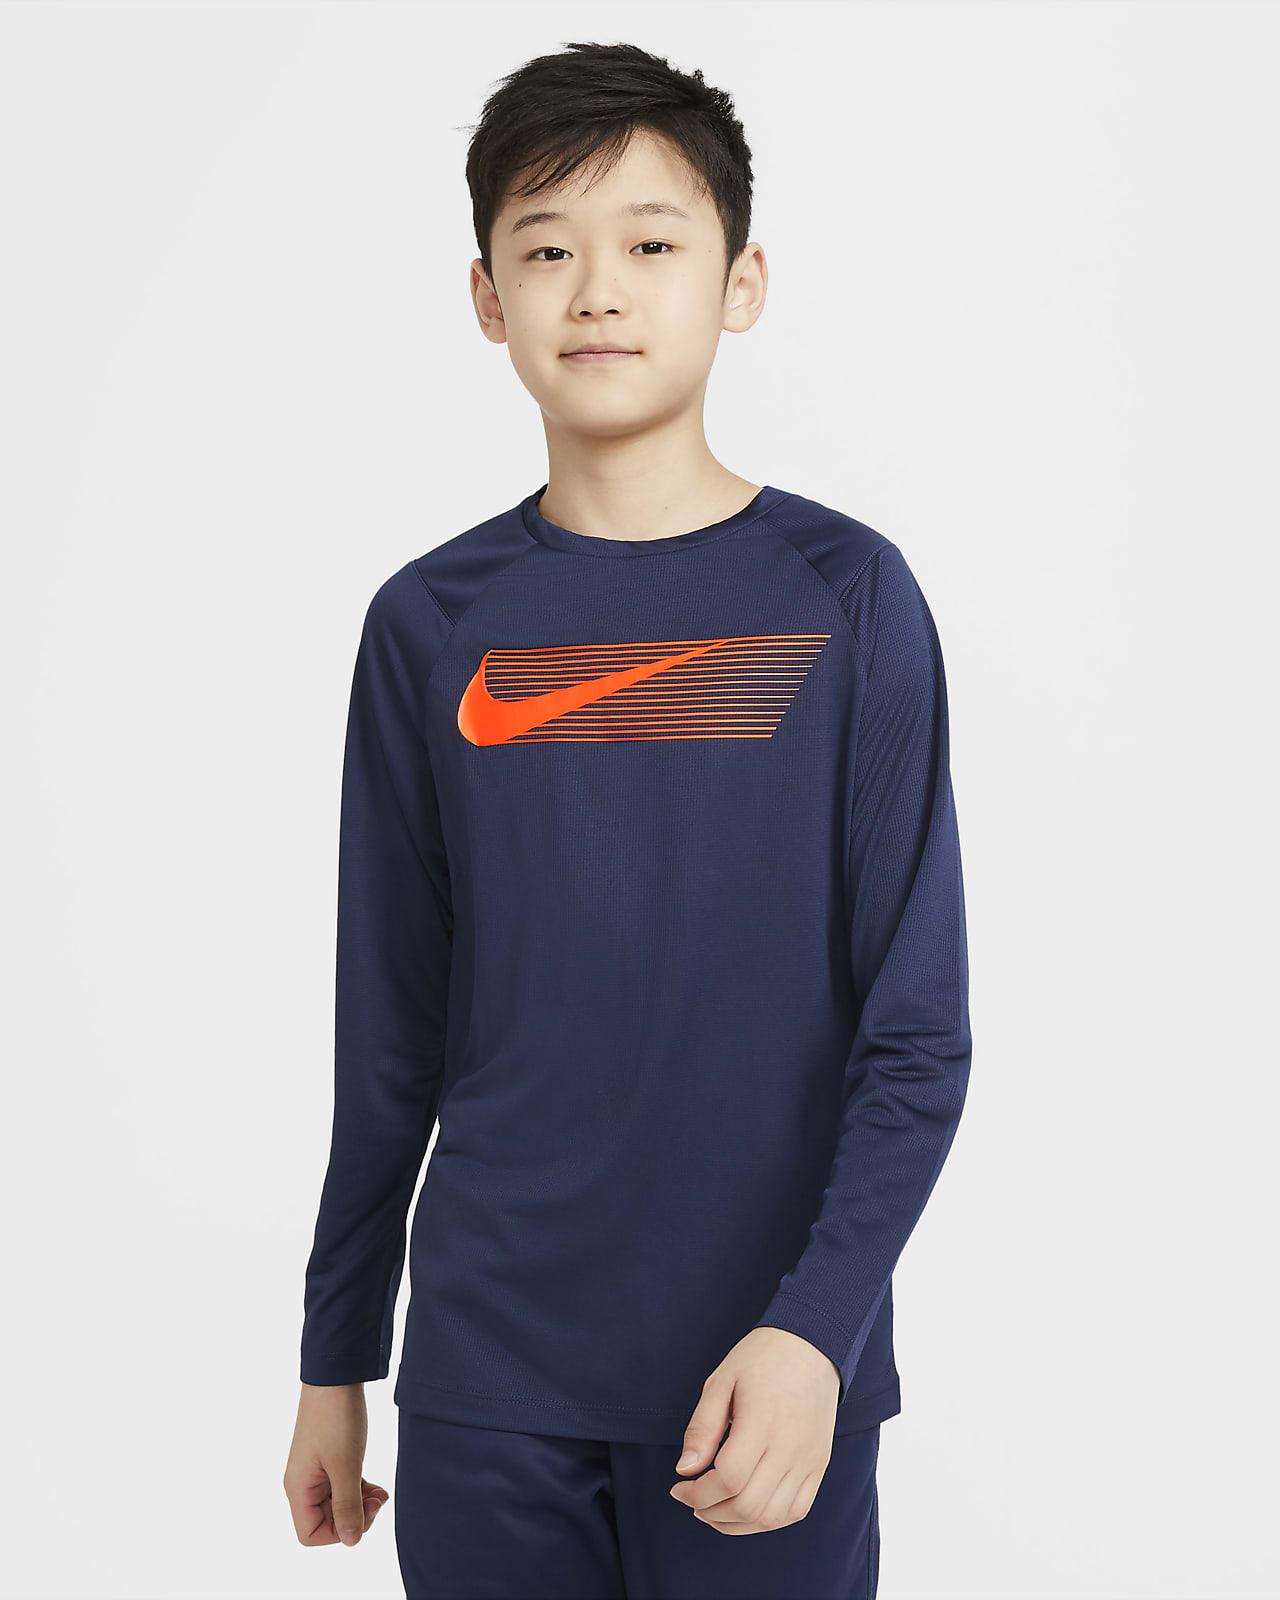 Nike Big Kids' (Boys') Graphic Long-Sleeve Training Top